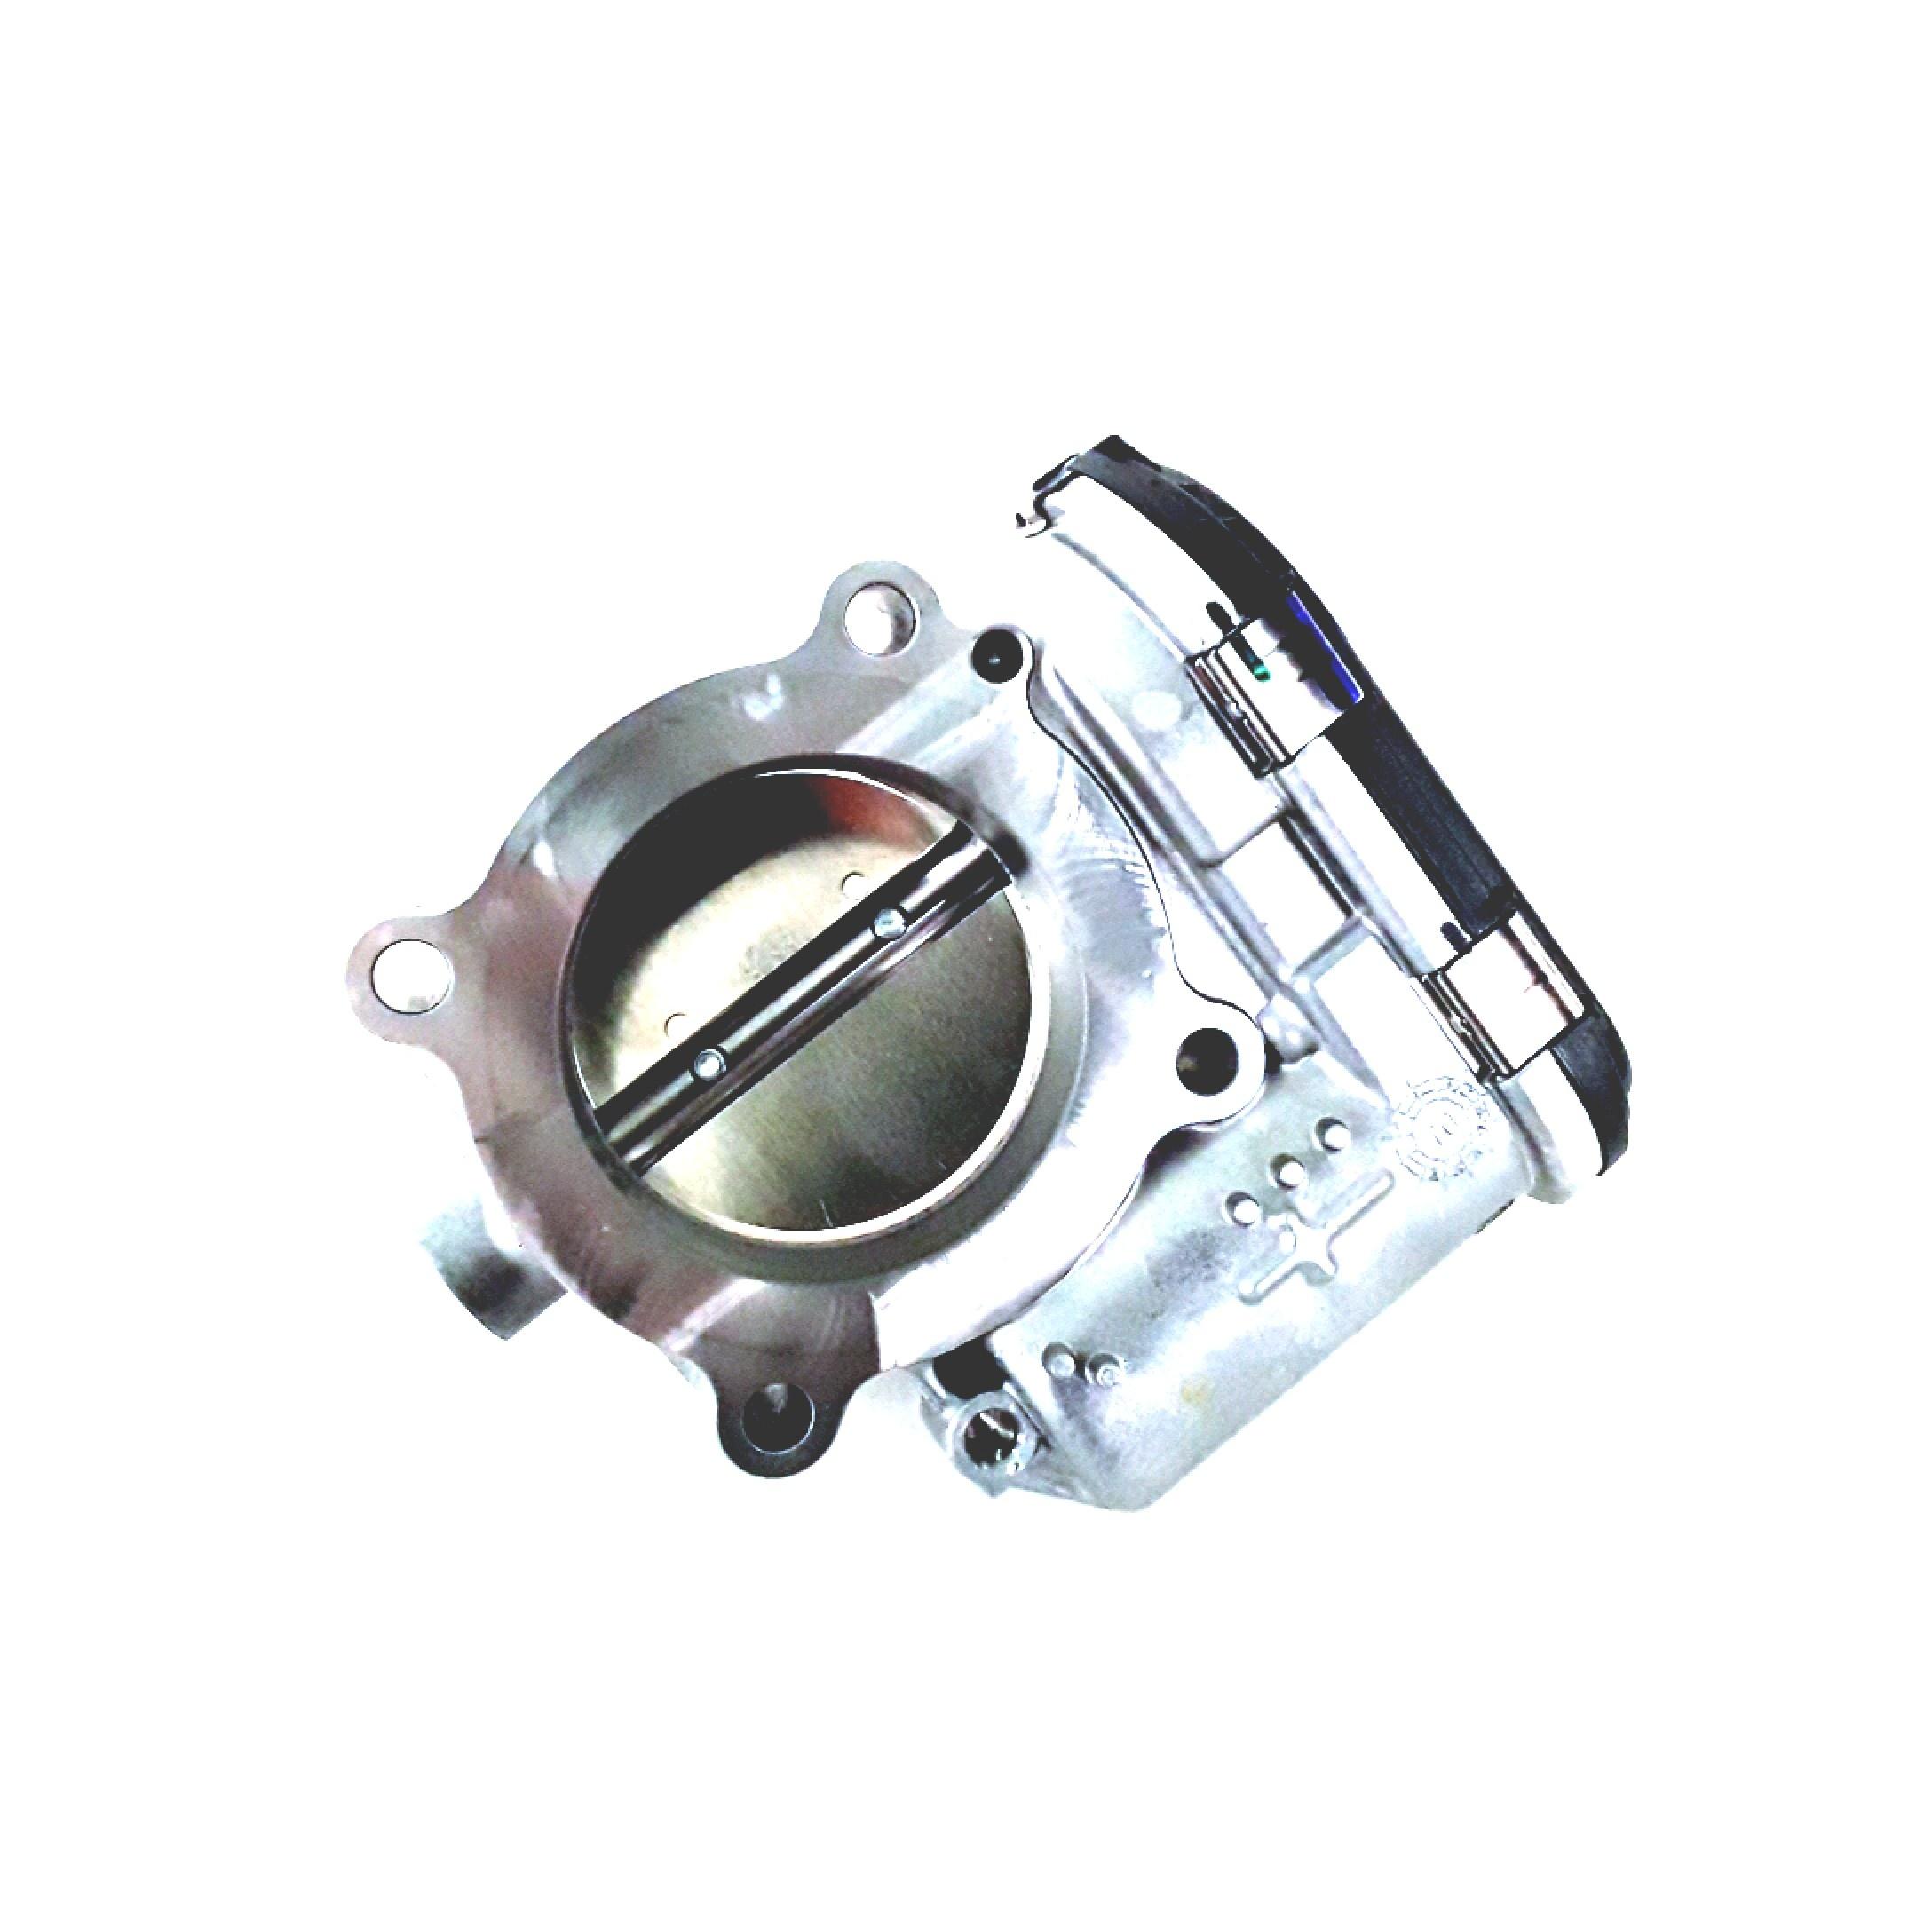 2014 Volkswagen Beetle Transmission: Volkswagen Beetle Fuel Injection Throttle Body. Jetta; 1